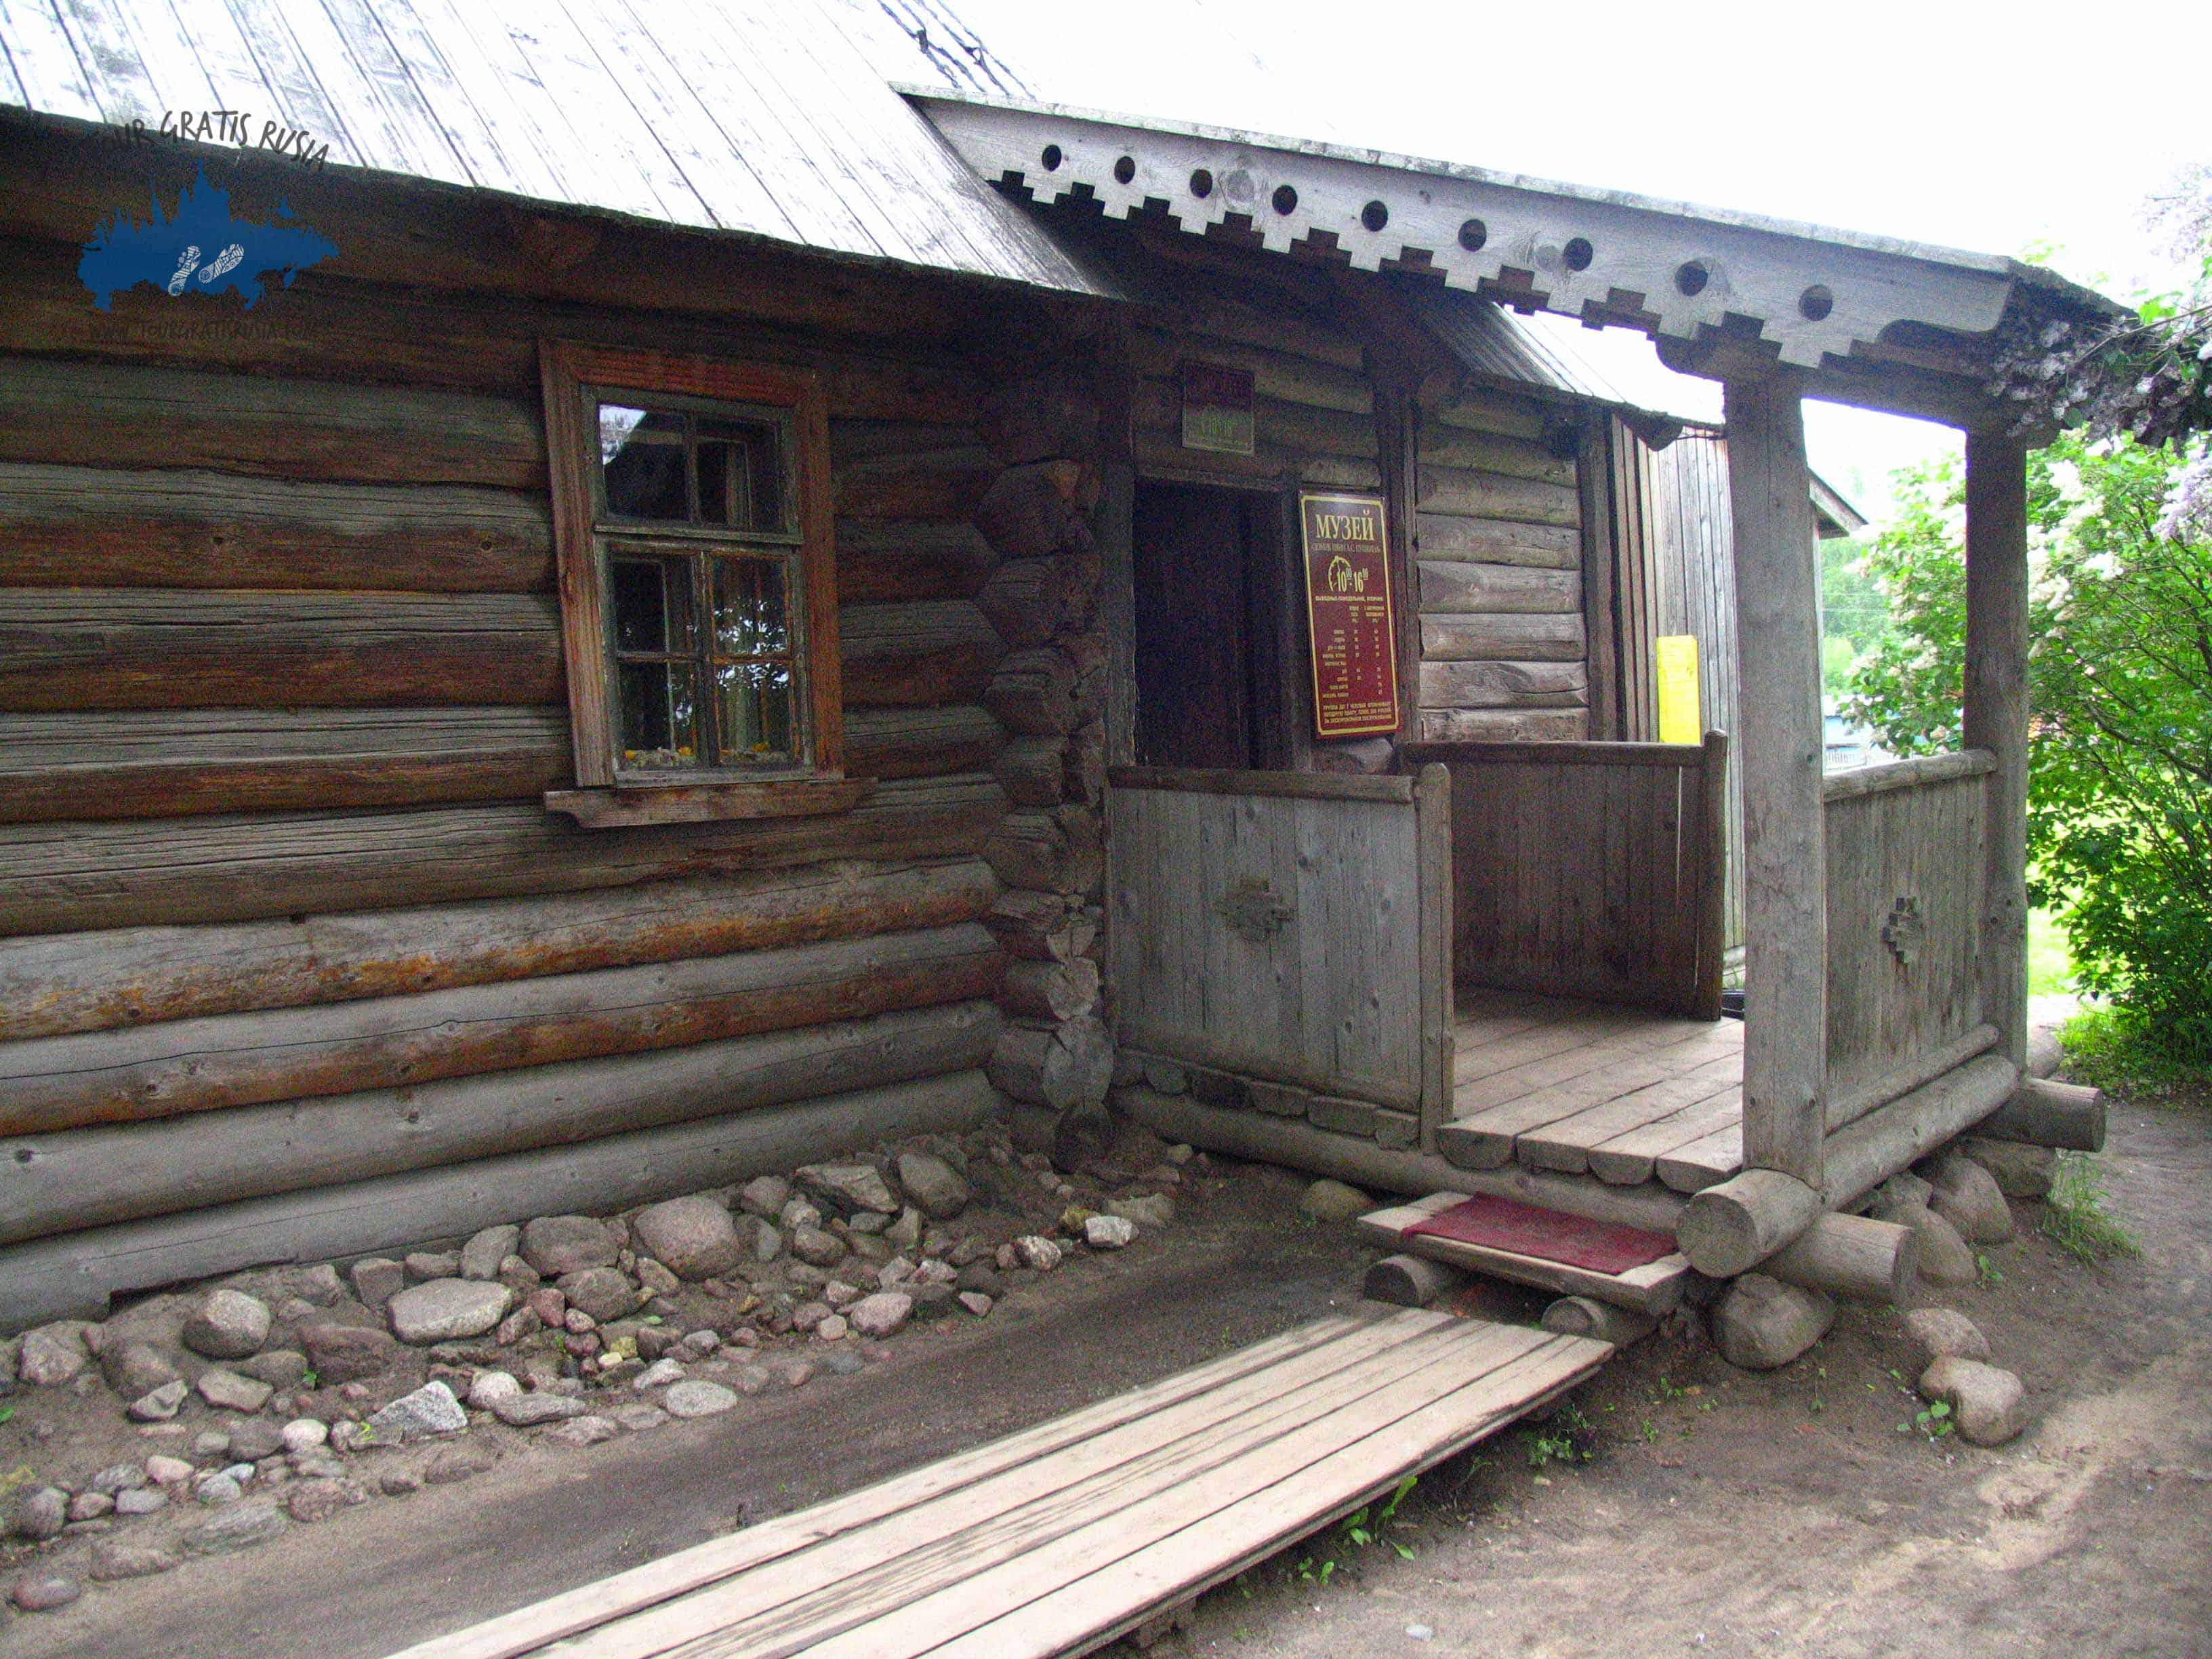 Conocer la cabaña de la Niñera de Pushkin